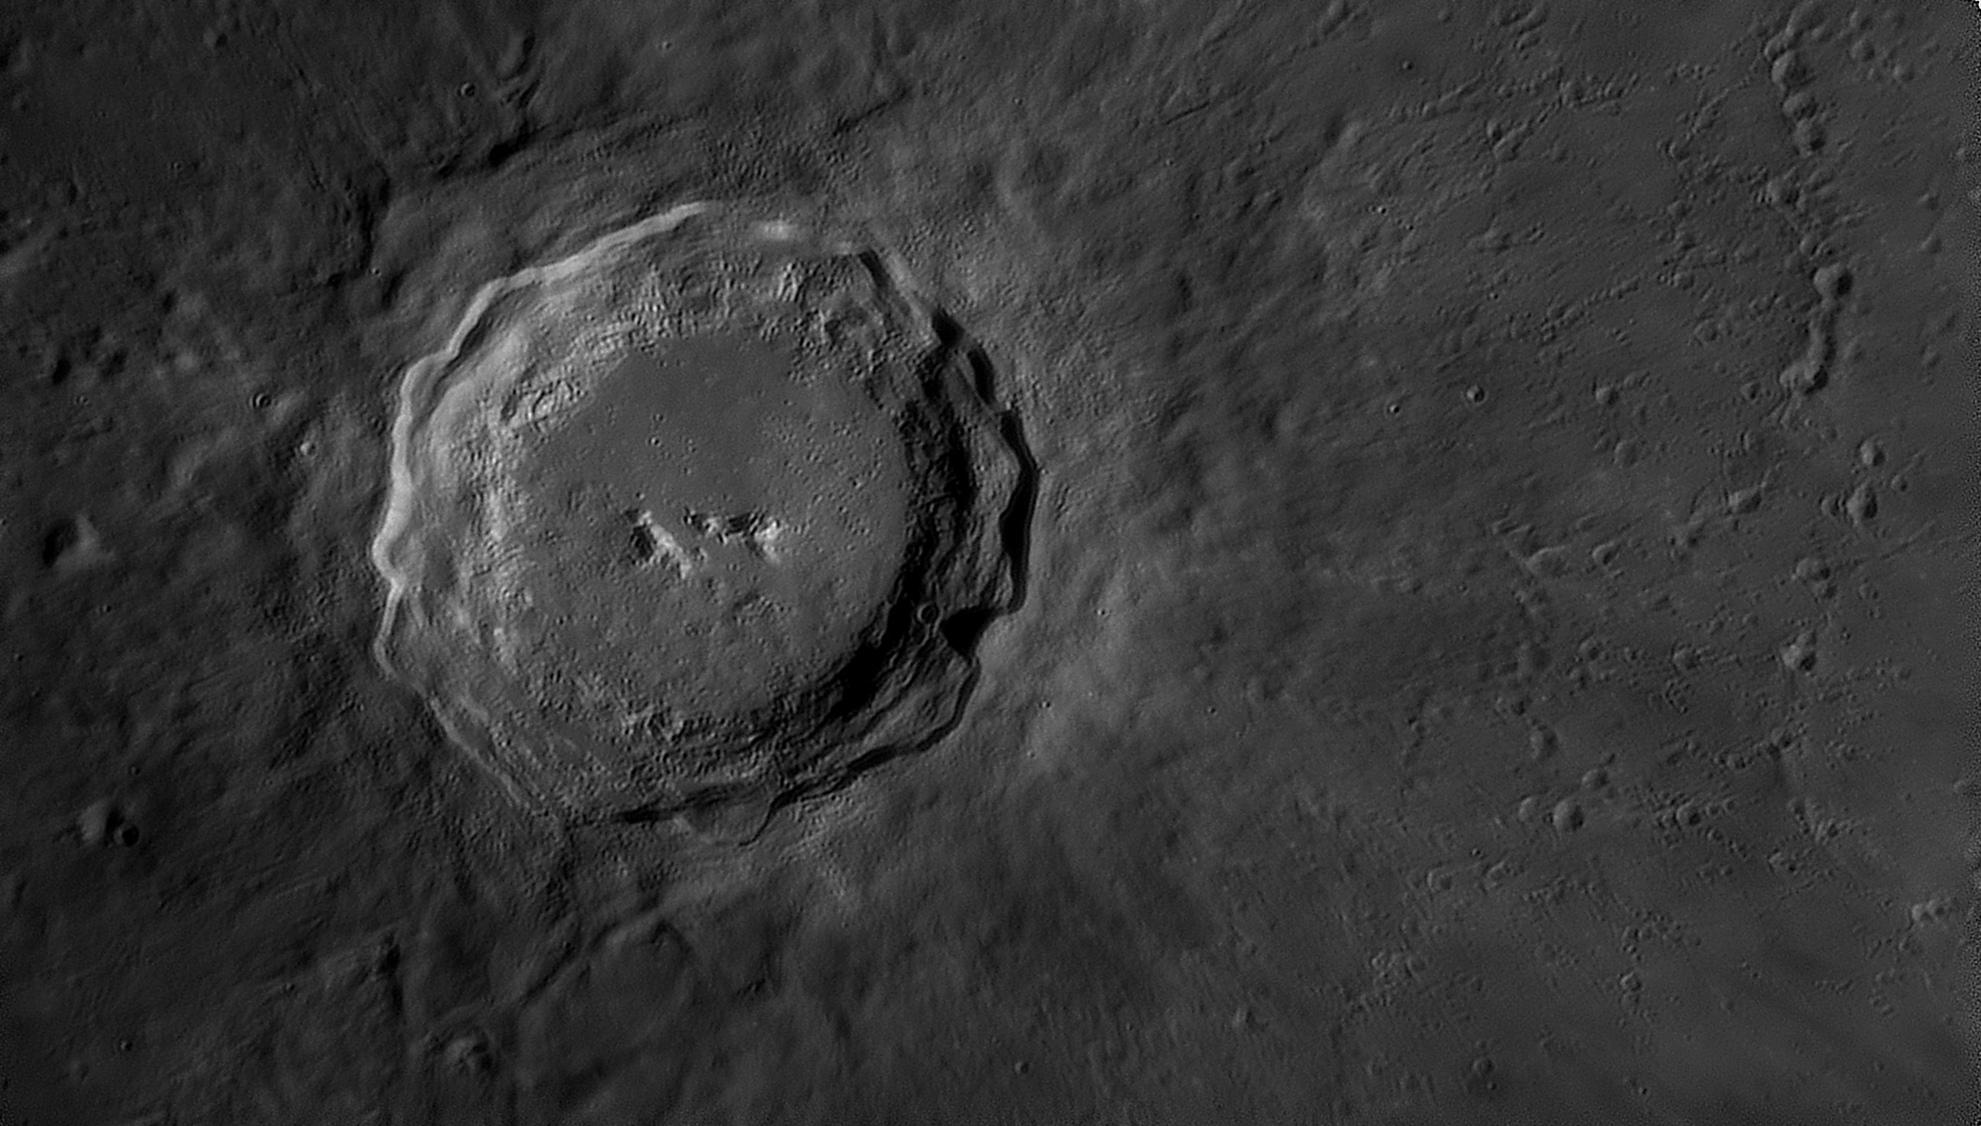 large.moon_03_04_2020_20_31_COPER.jpg.12f804c8015e792419fd2067dd4c5b91.jpg